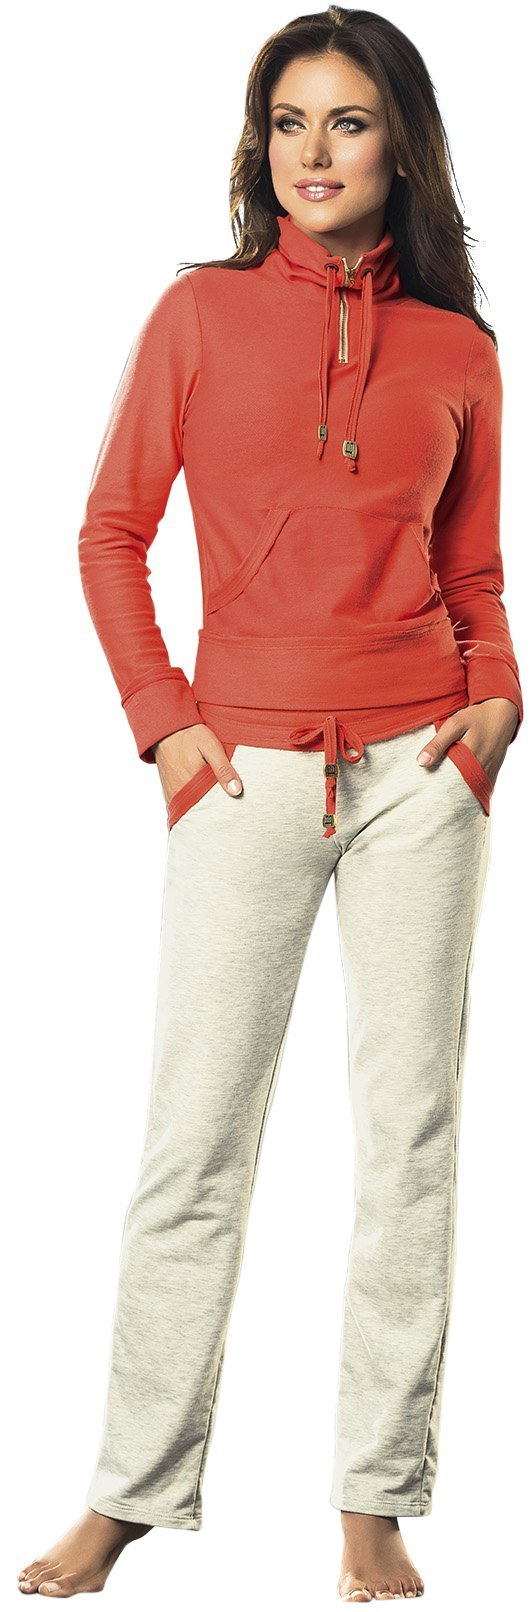 Adriana Arango 3 Piece Women's Gym Outfit Set Long Sleeve Jacket Top Pants S 169 by Adriana Arango